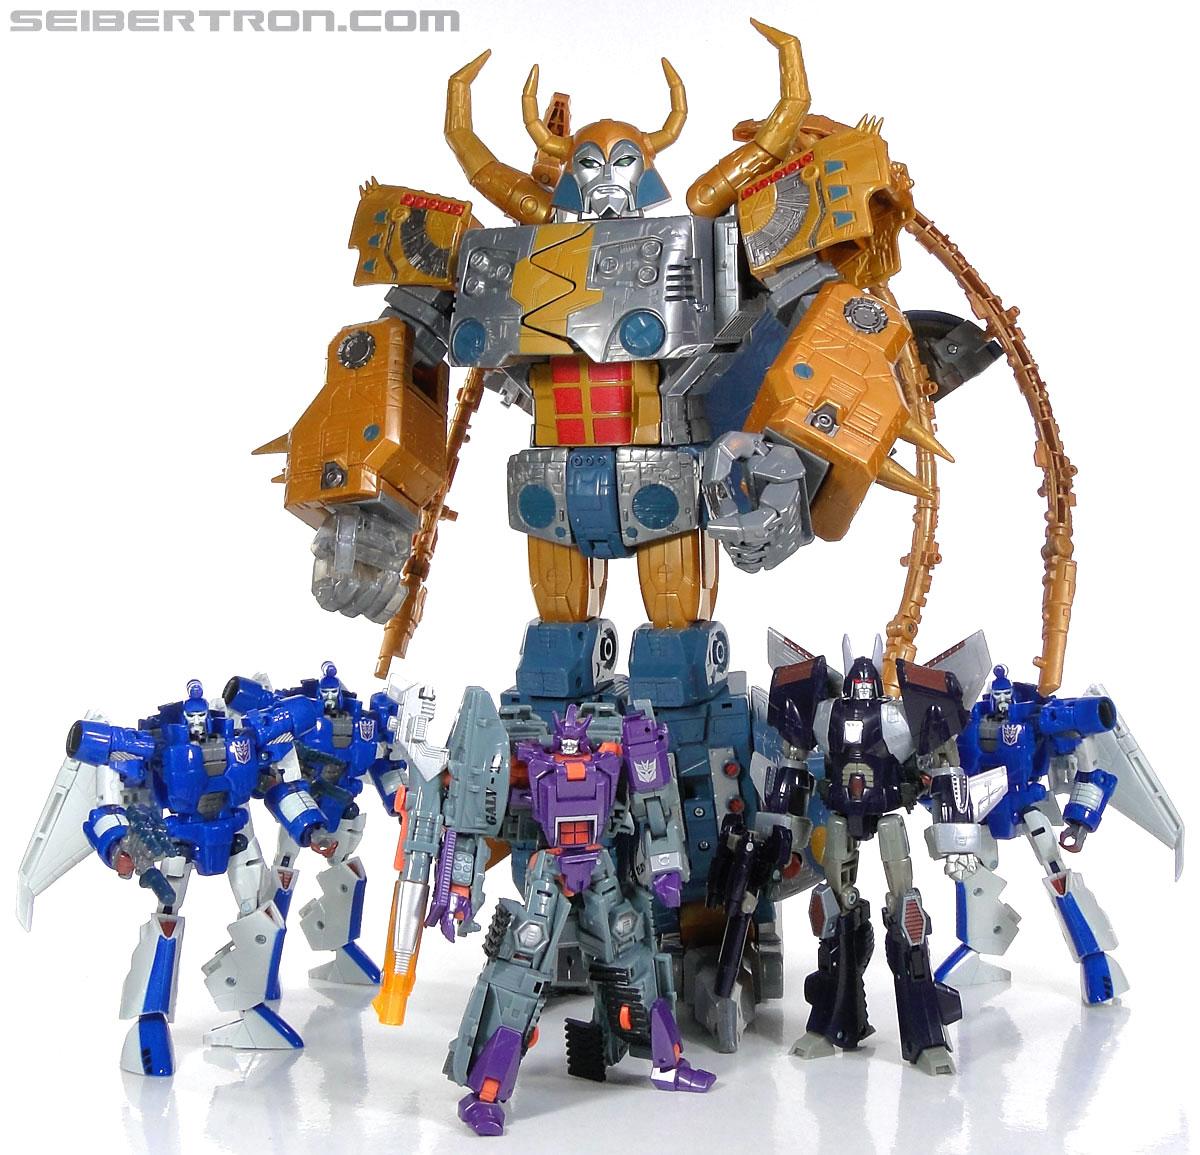 Transformers Generations Unicron (25th Anniversary) (Universal Dominator Unicron) (Image #256 of 262)